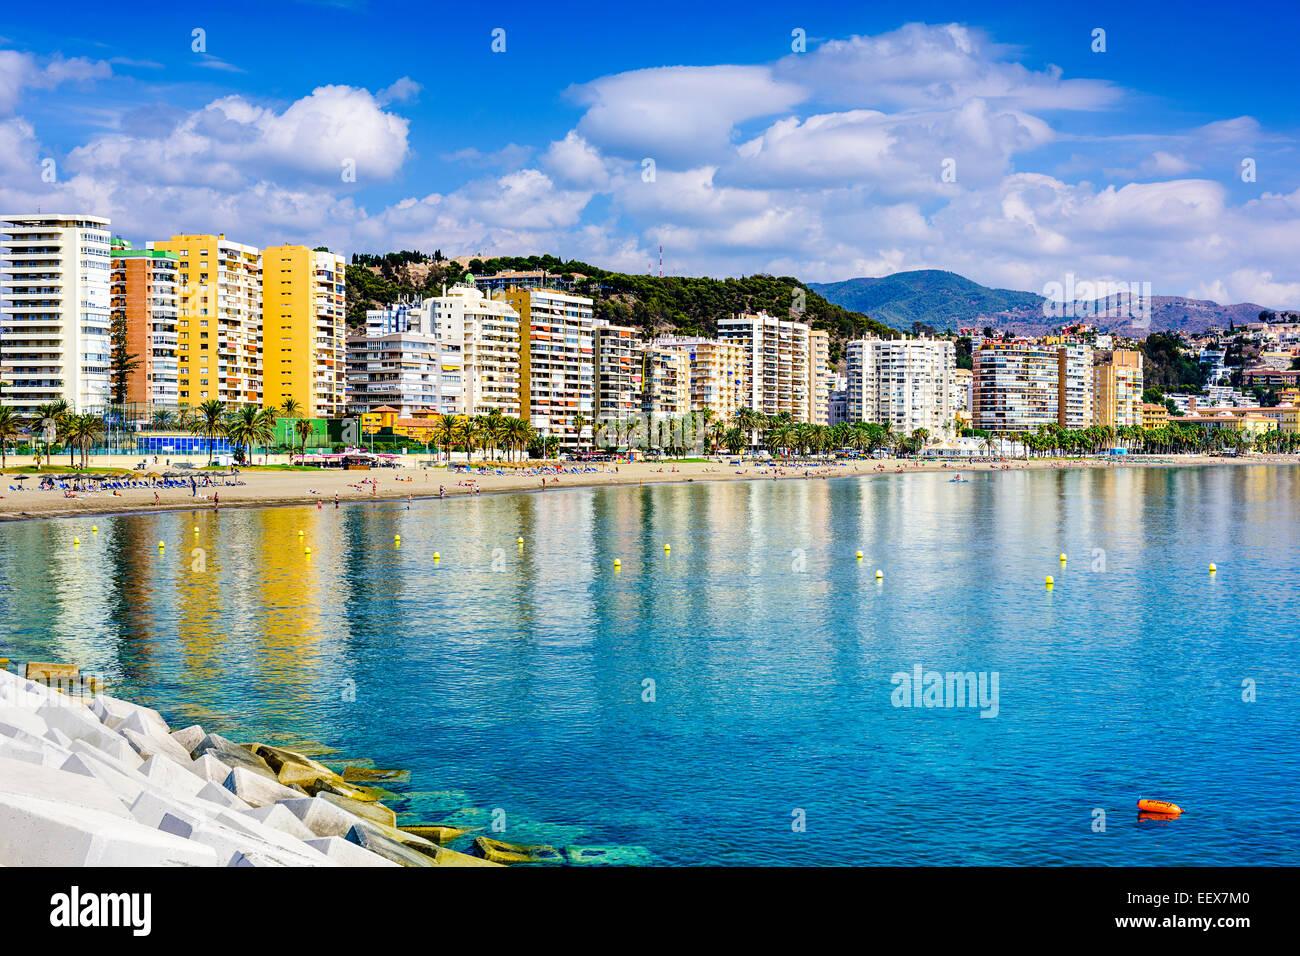 Malaga, Spain beachfront skyline at Playa de la Malagueta. - Stock Image